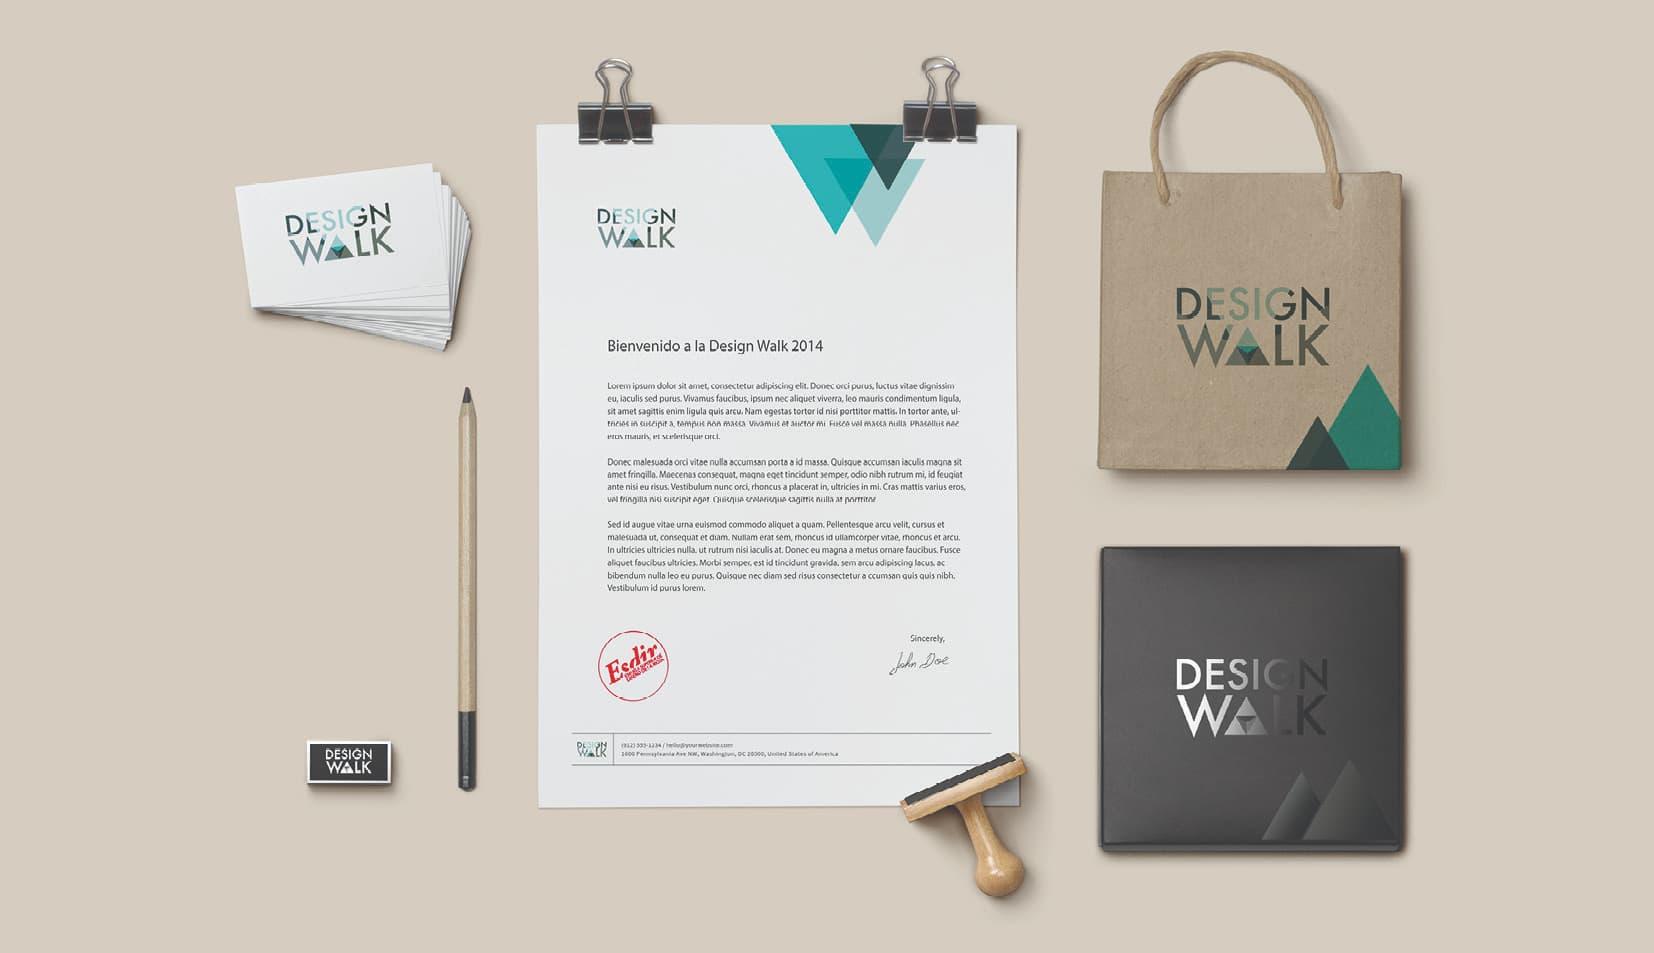 Design Walk